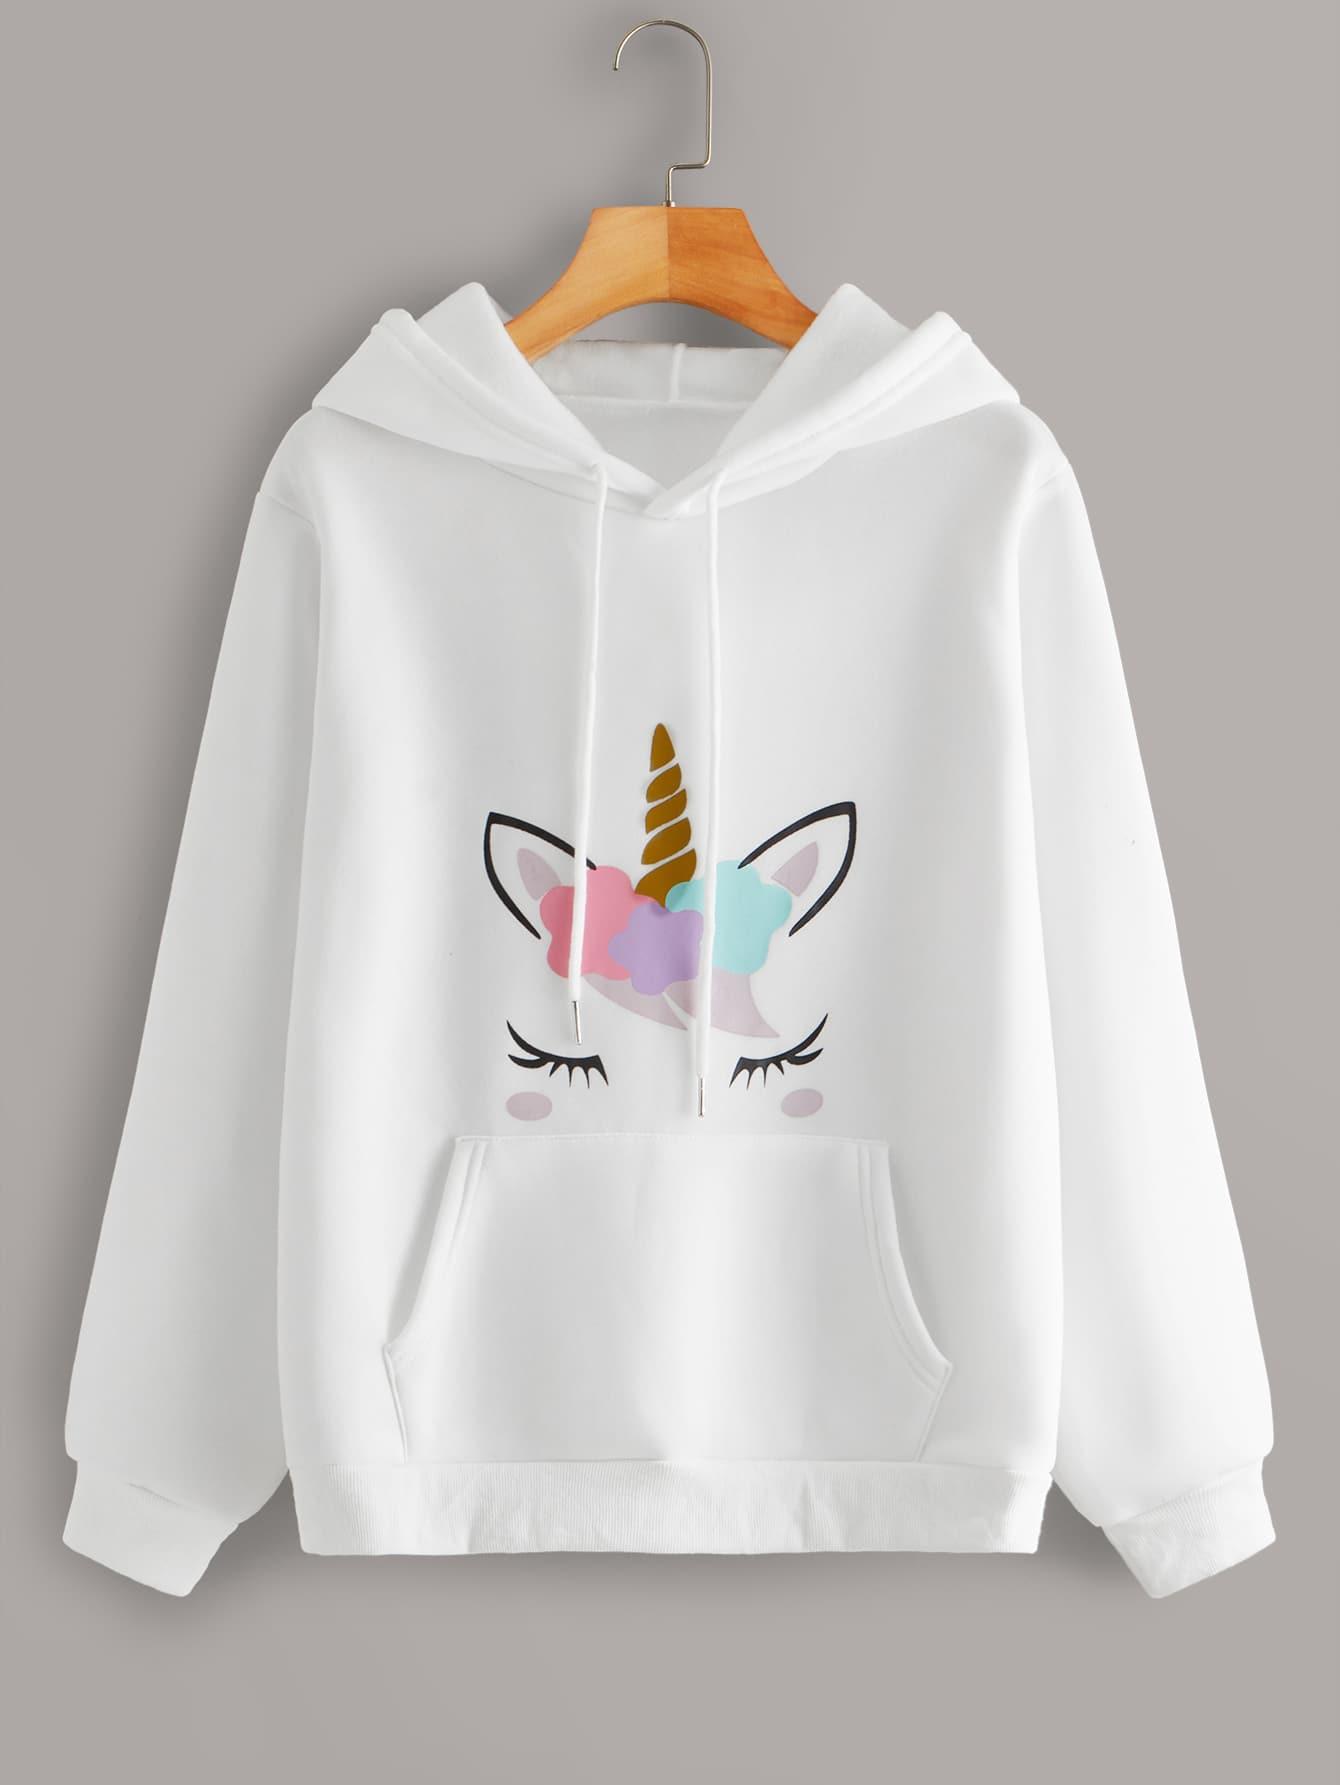 EnlaMorea Little Kids 3D Unicorn Print Pullover Hoodies with Pocket Hooded Sweatshirt Size 3-12